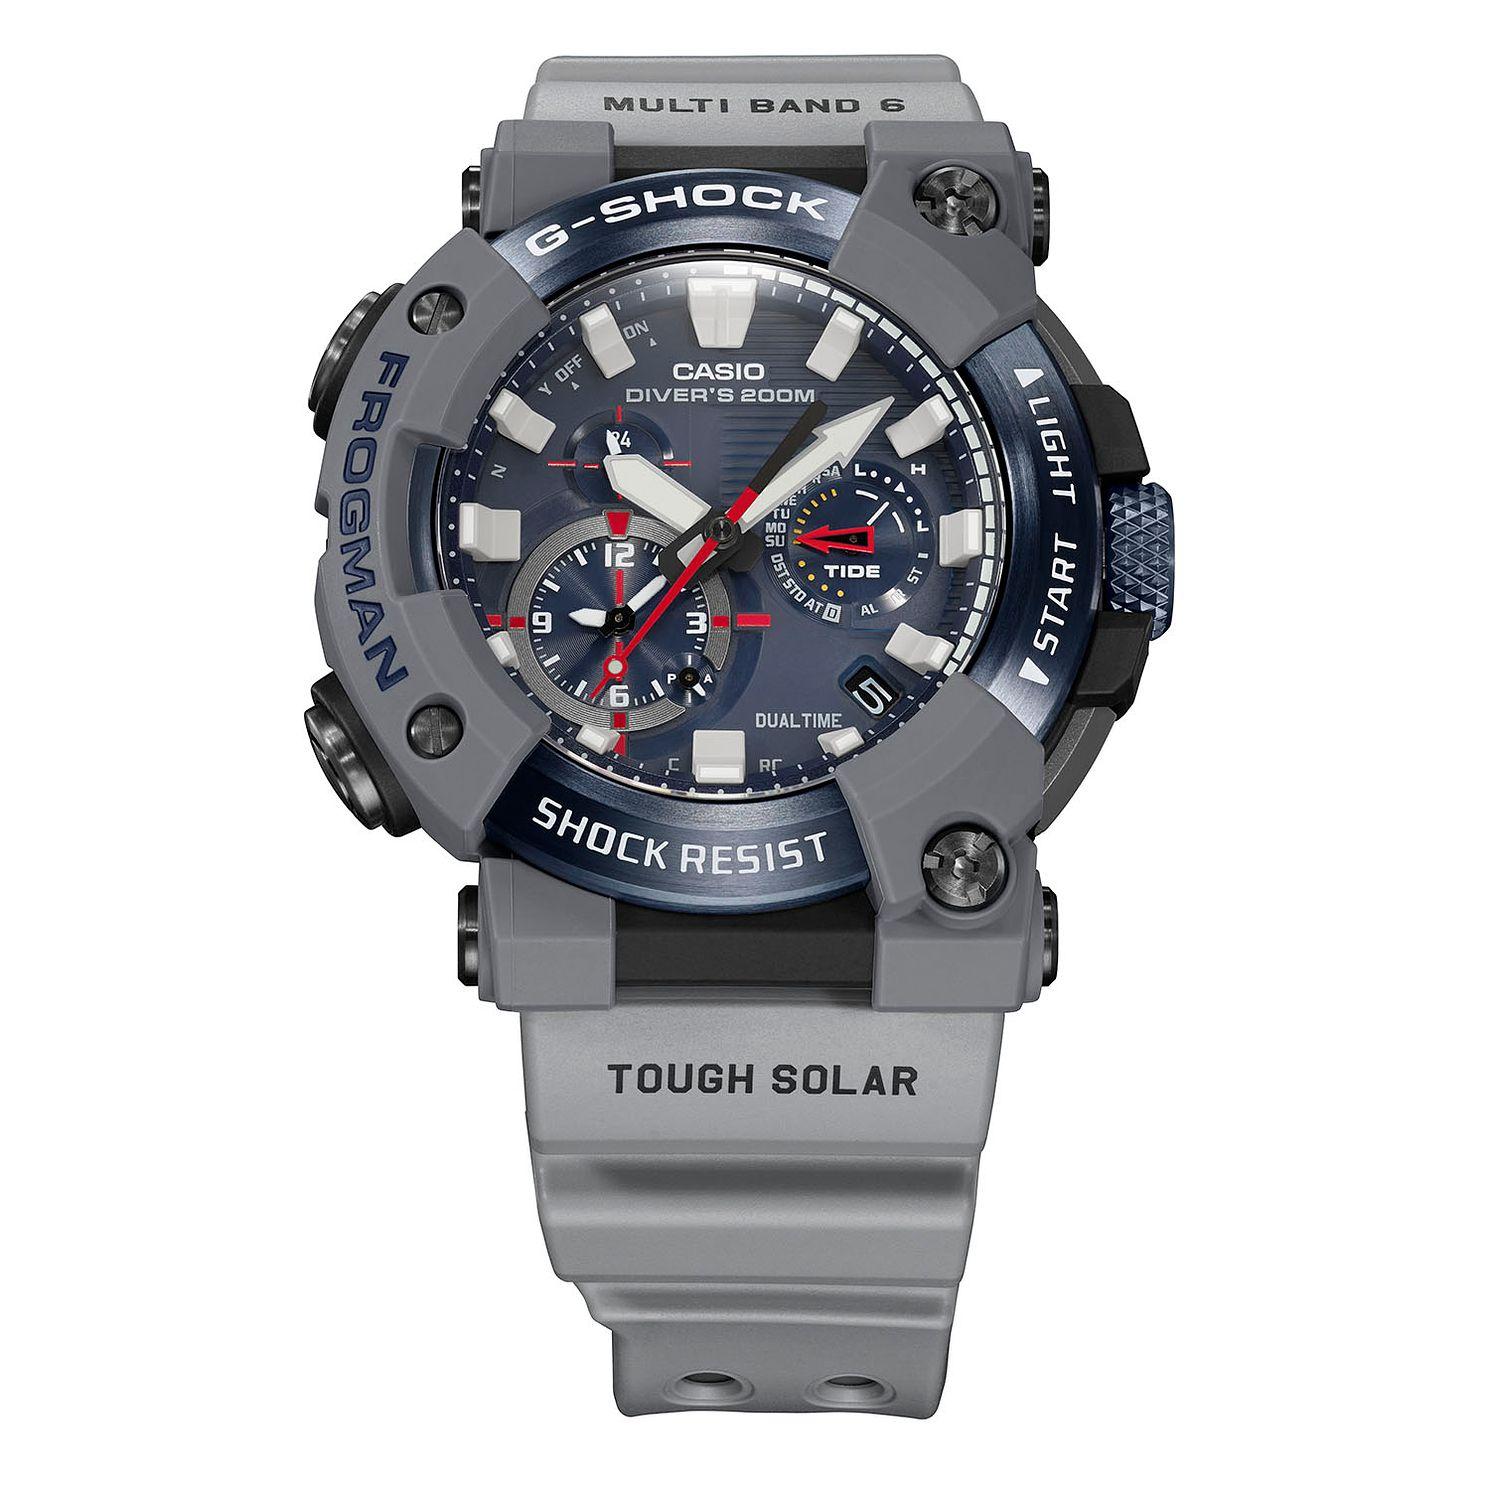 GShock Frogman Royal Navy Collaboration Special Edition watch - £639 @ Ernest Jones